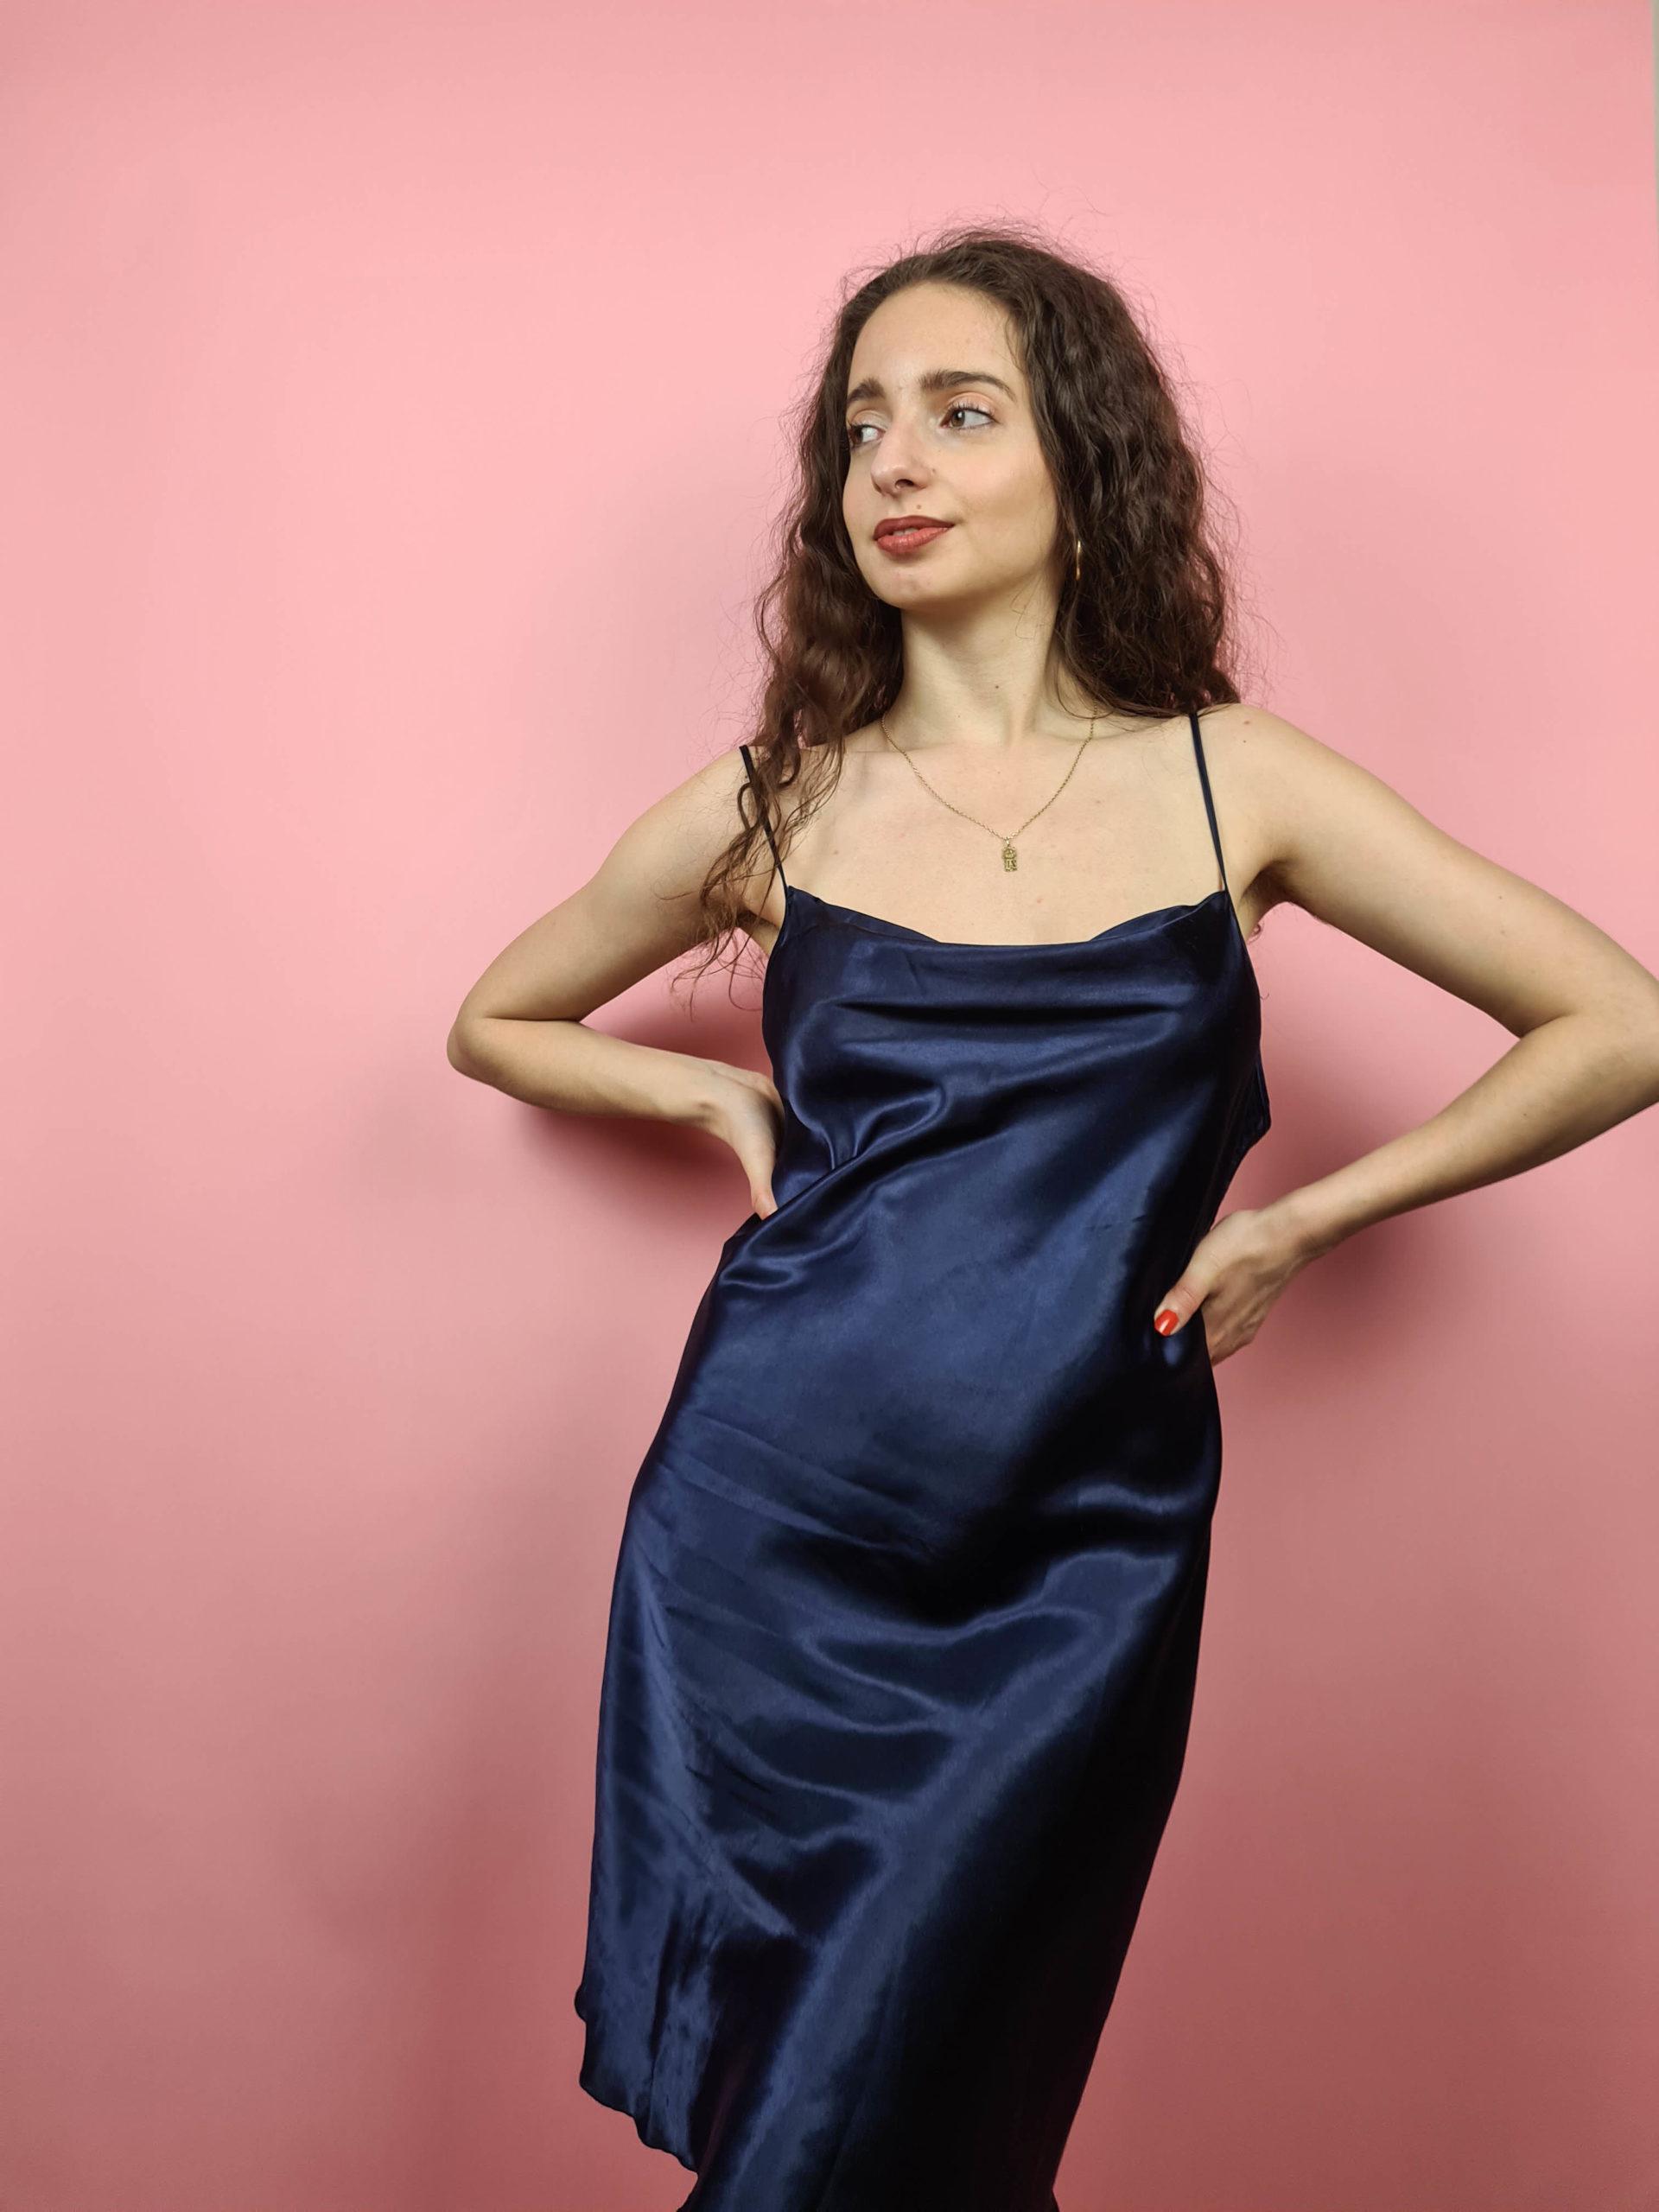 robe nuisette bleu marine col bénitier (10)